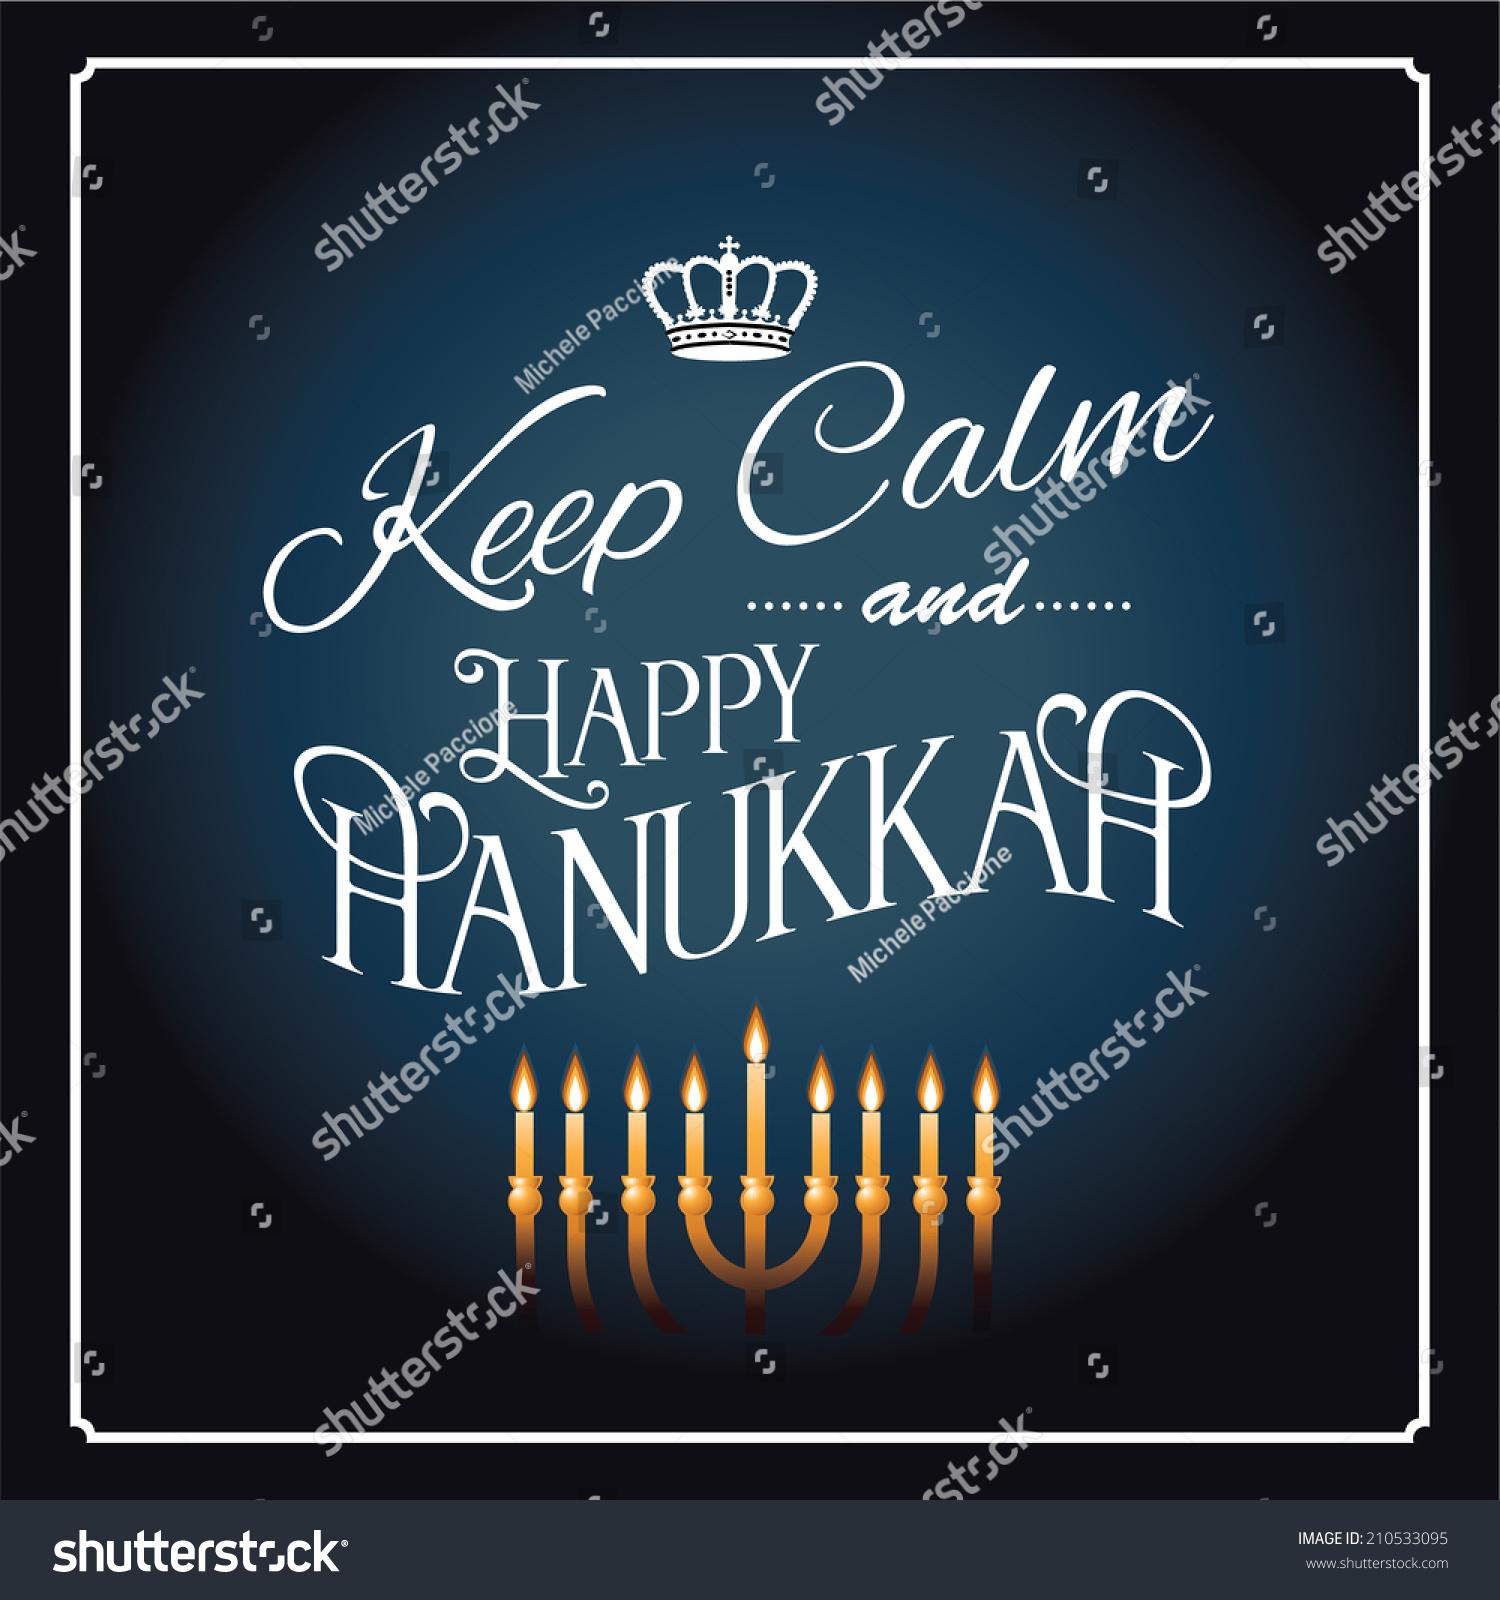 Royalty Free Keep Calm And Happy Hanukkah Greeting 210533095 Stock